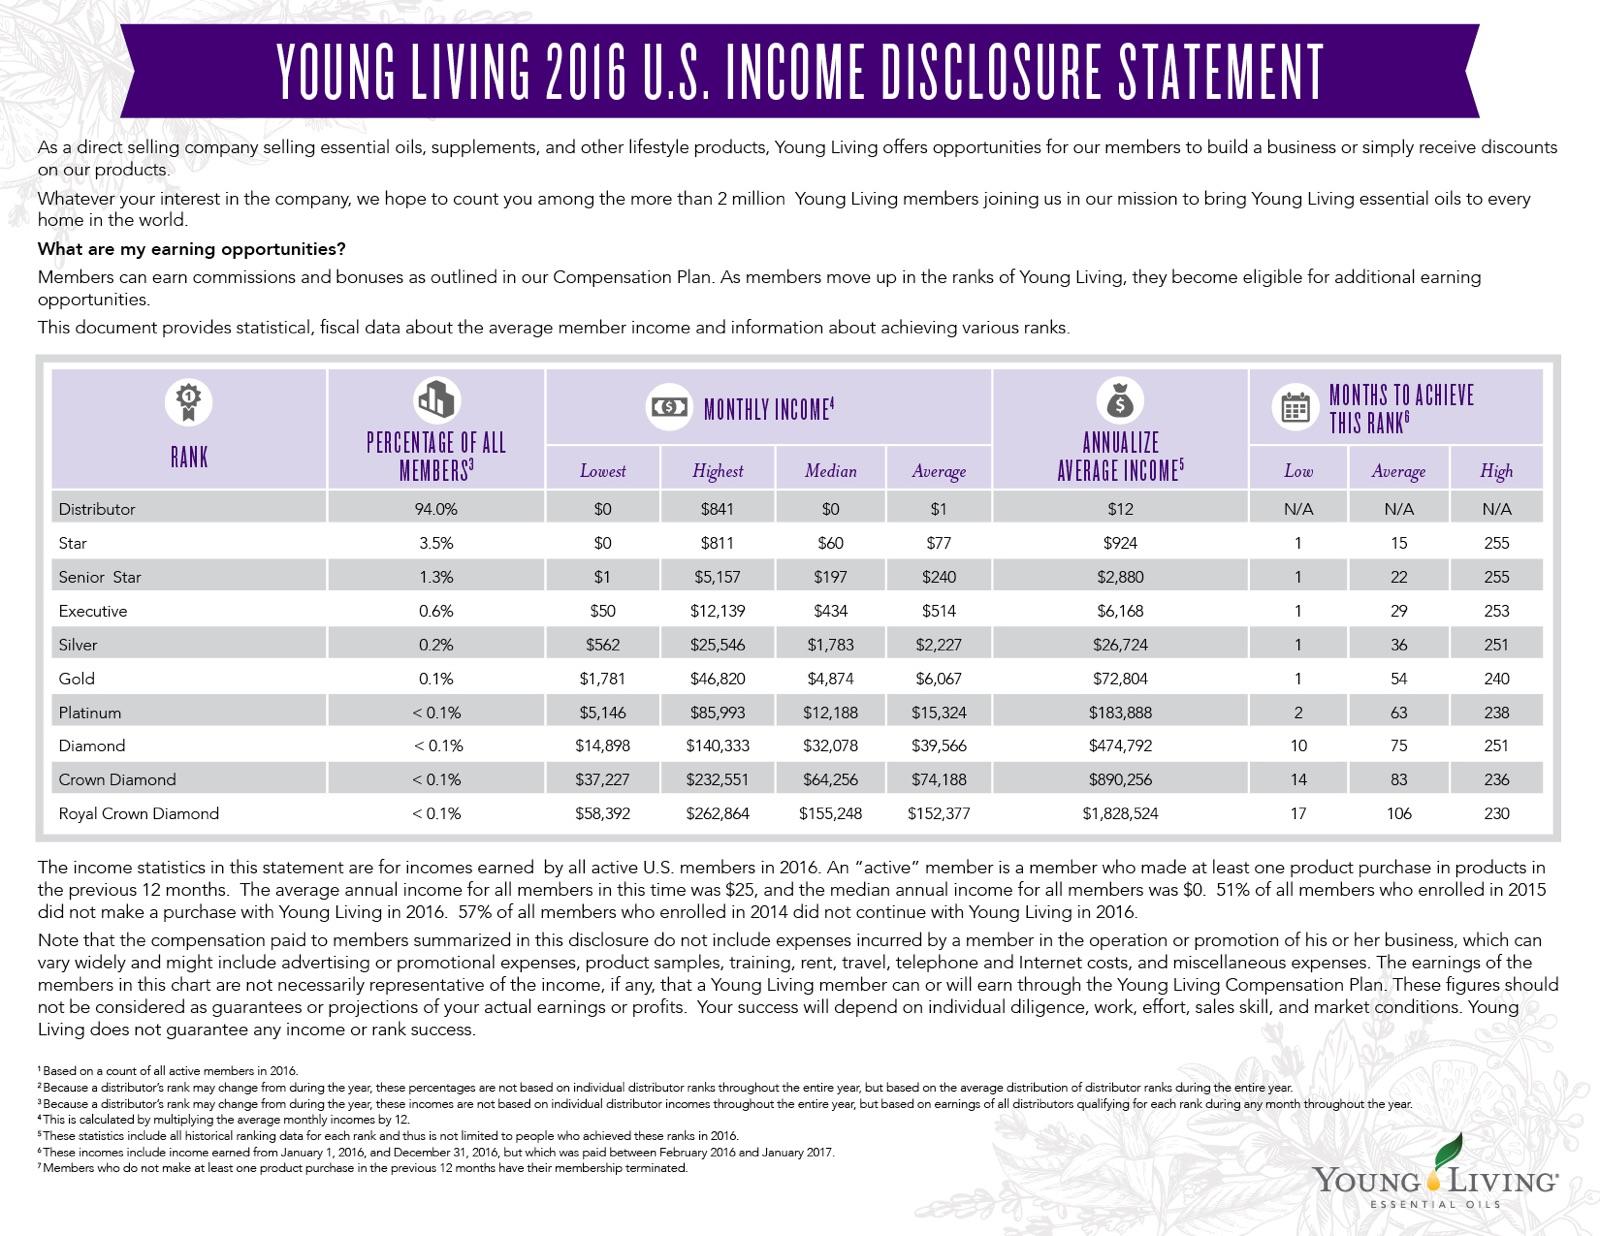 incomedisclosurestatement_image_us.jpg.jpeg